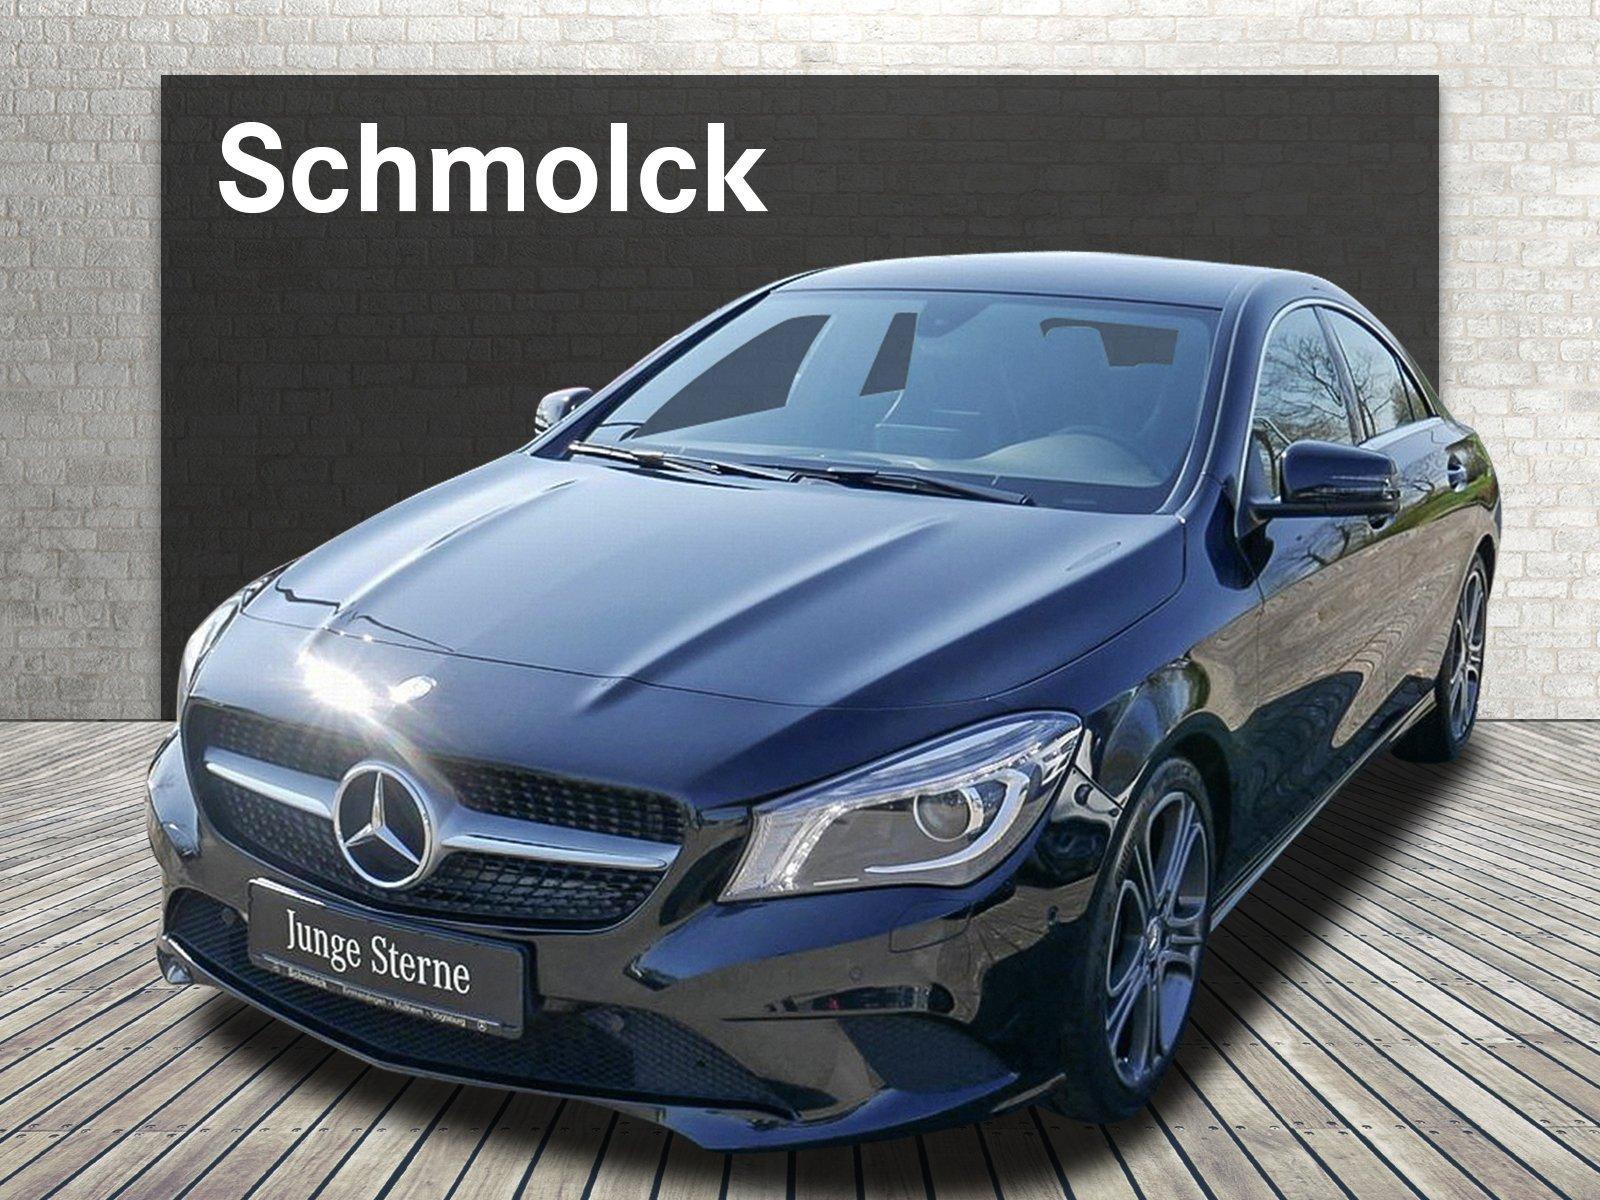 "Mercedes-Benz CLA 220 CDI URBAN/XENON/AUTOMATIK/18""/SHZ/NAVI, Jahr 2014, diesel"